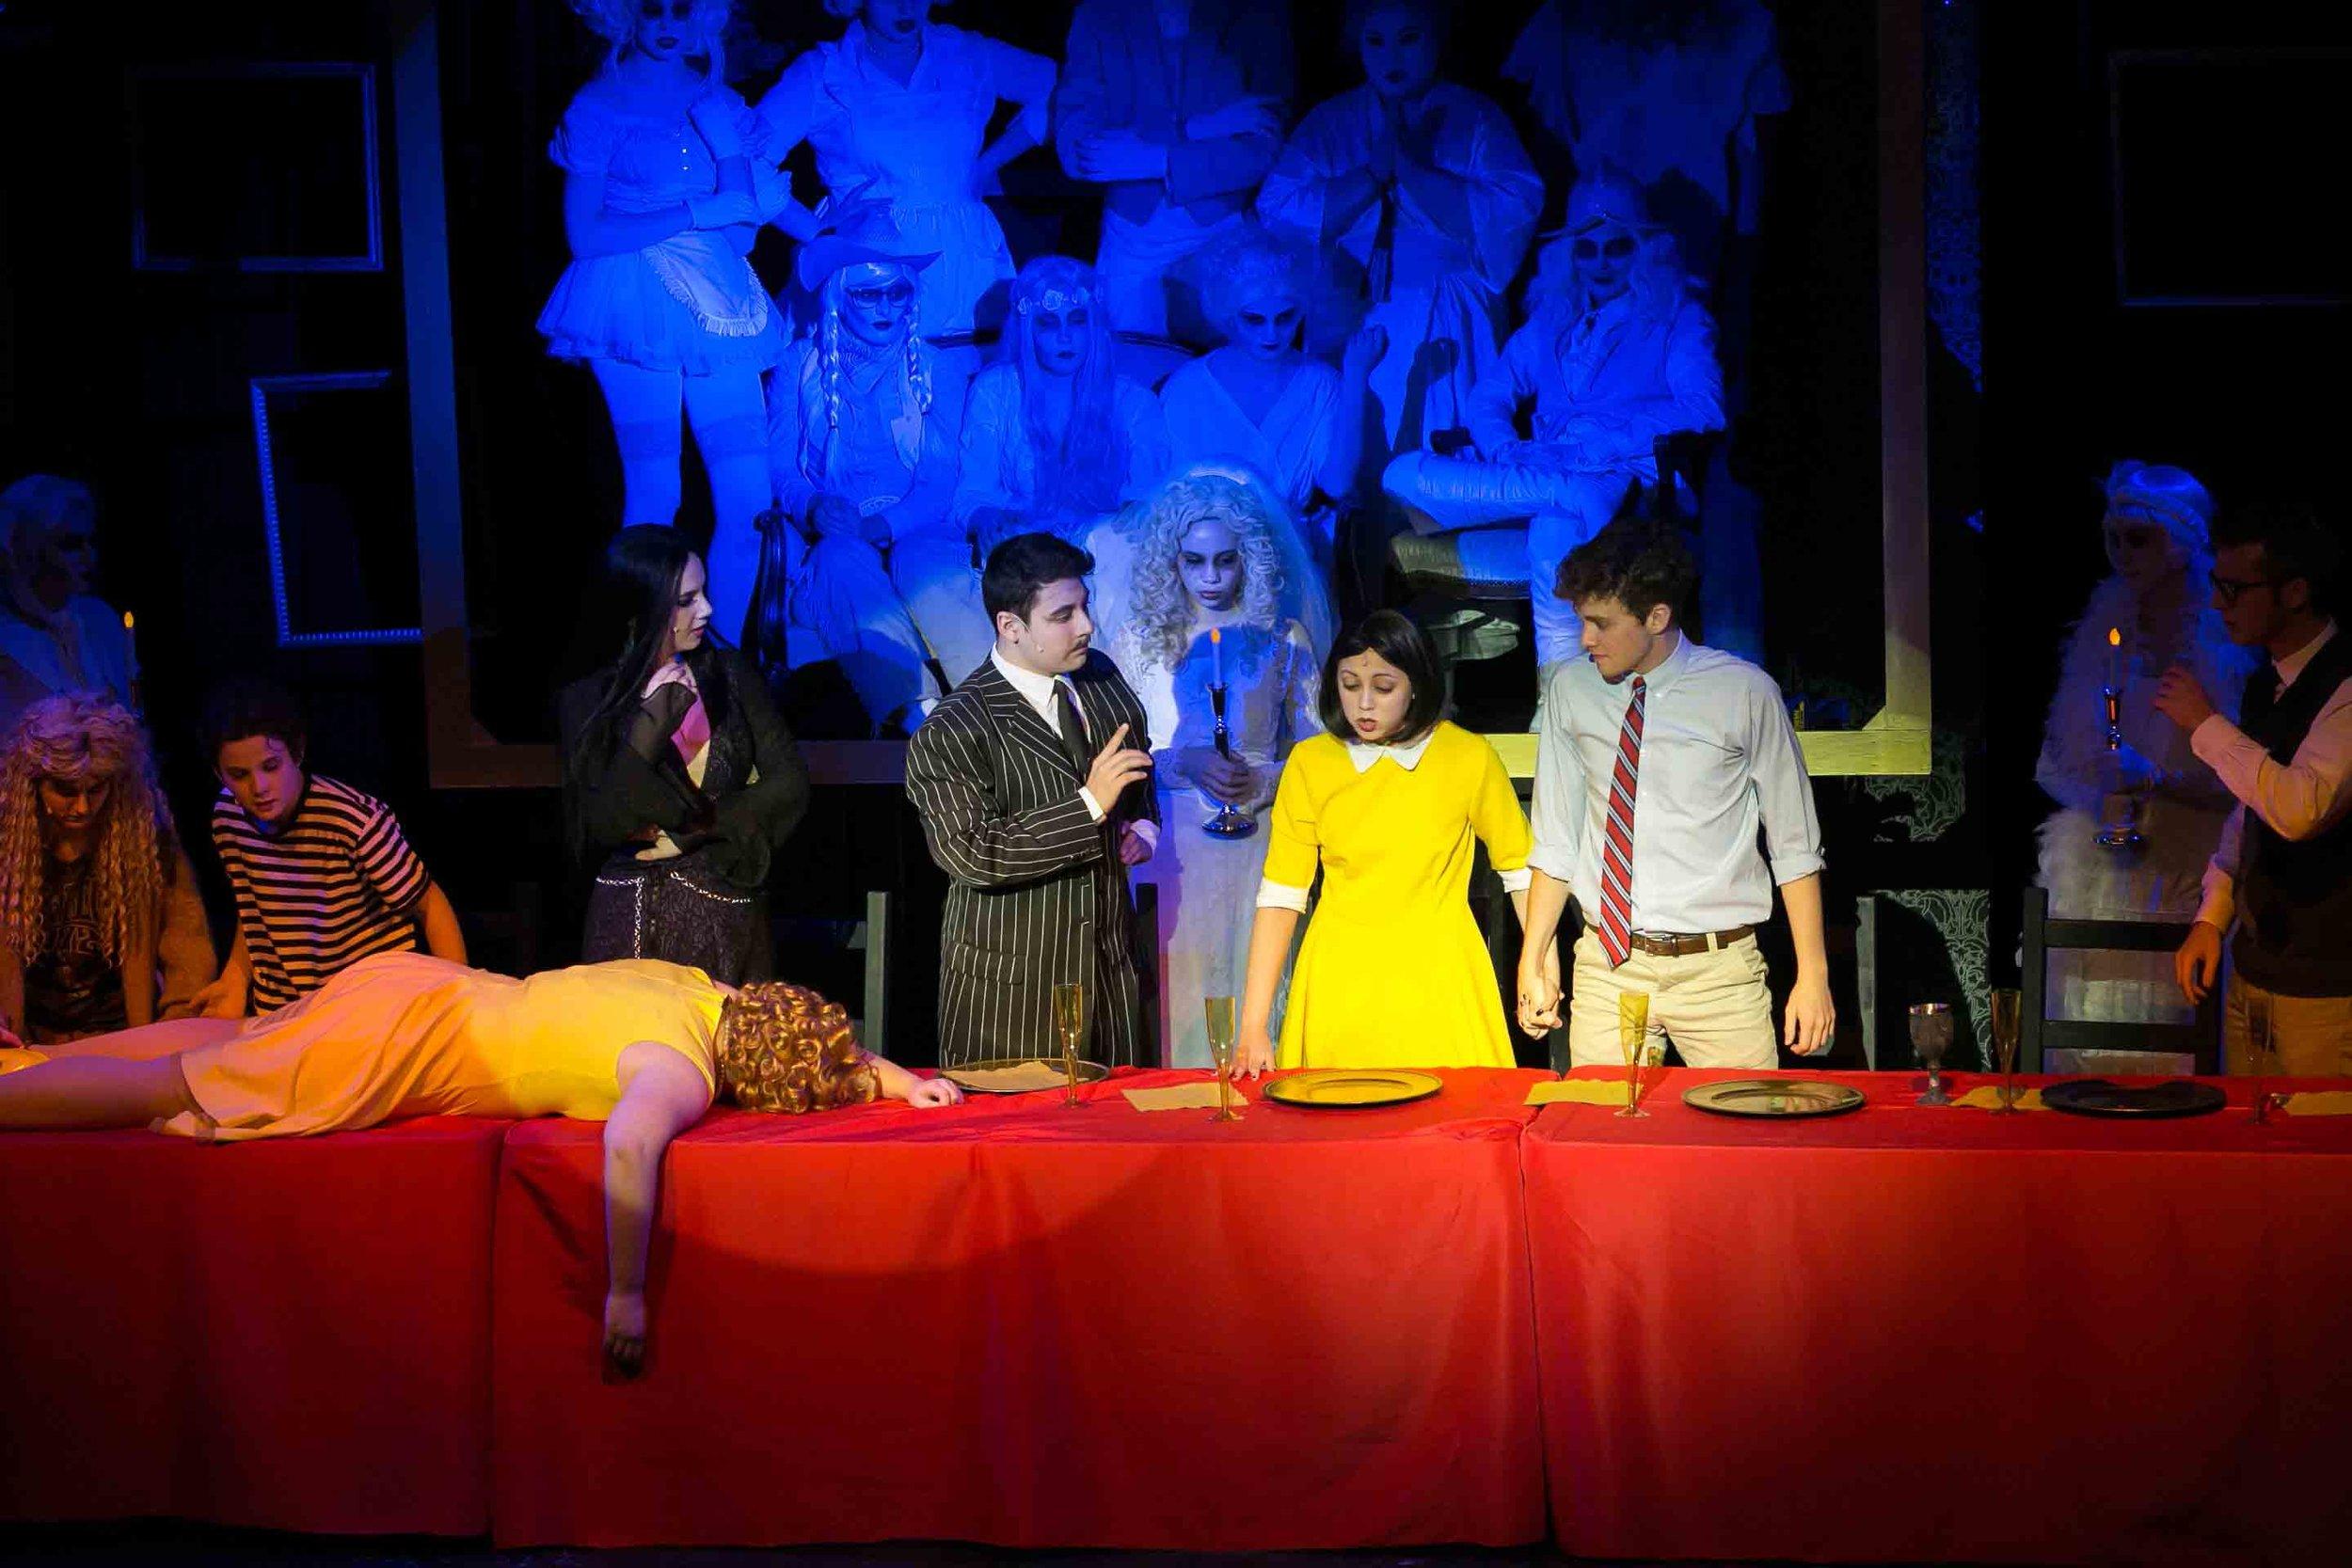 6-19-16 Addams Family Creepy Cast 0205.jpg